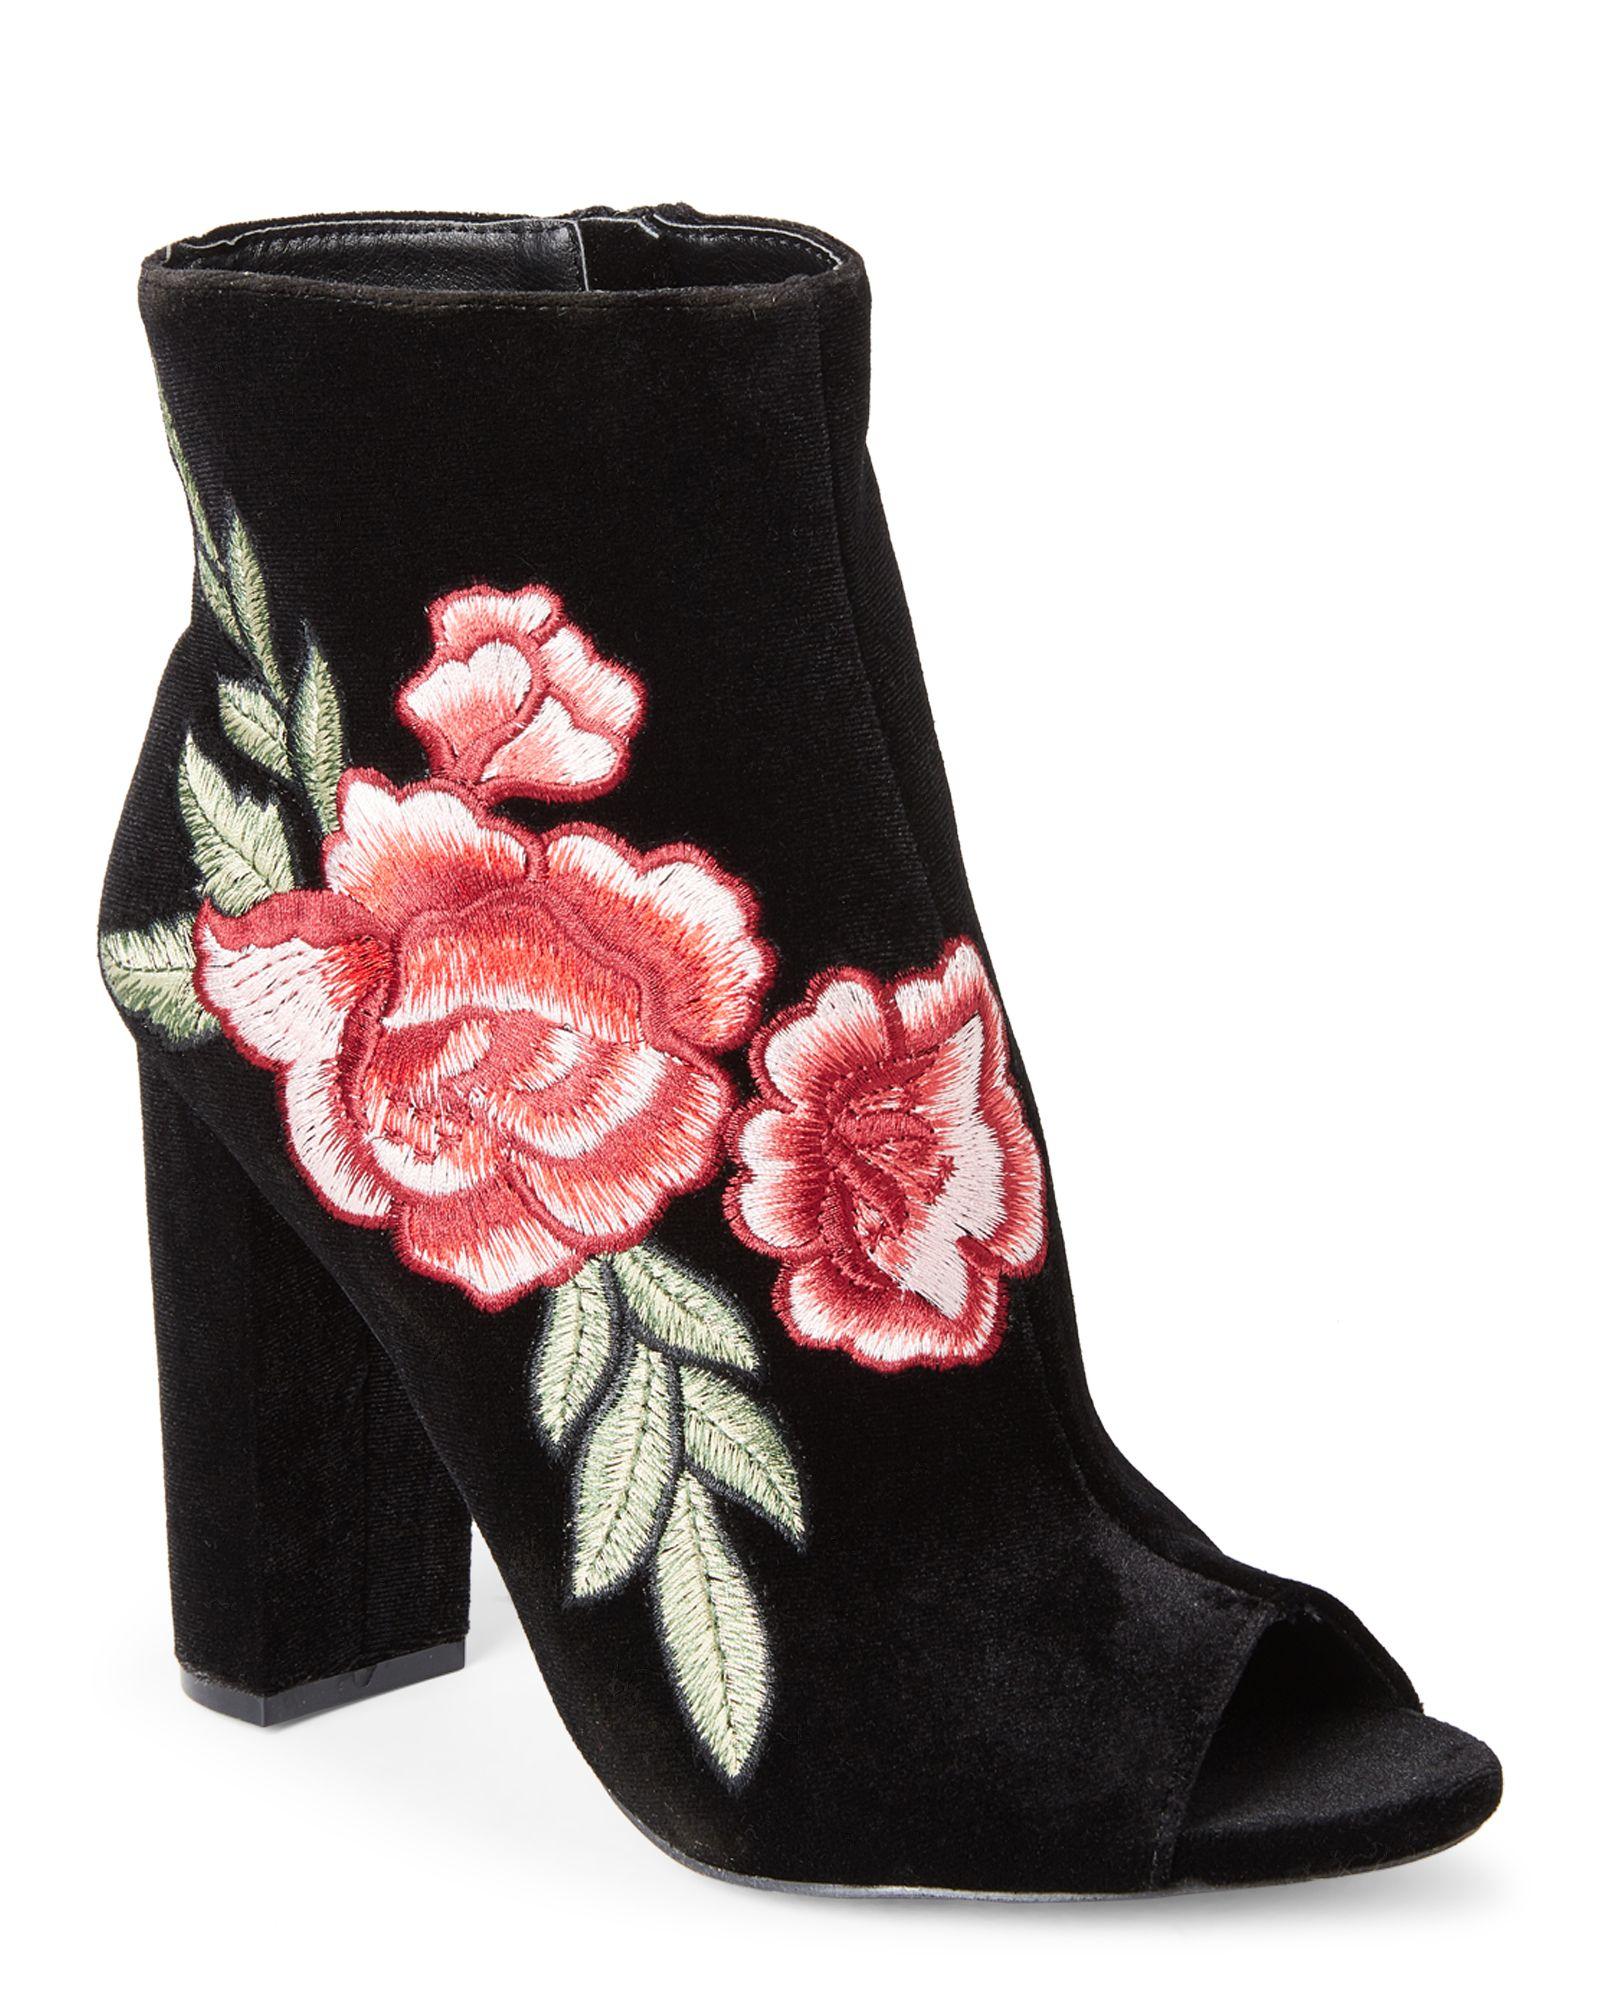 2c5e93331d7 Black Morris Embroidered Peep Toe Booties